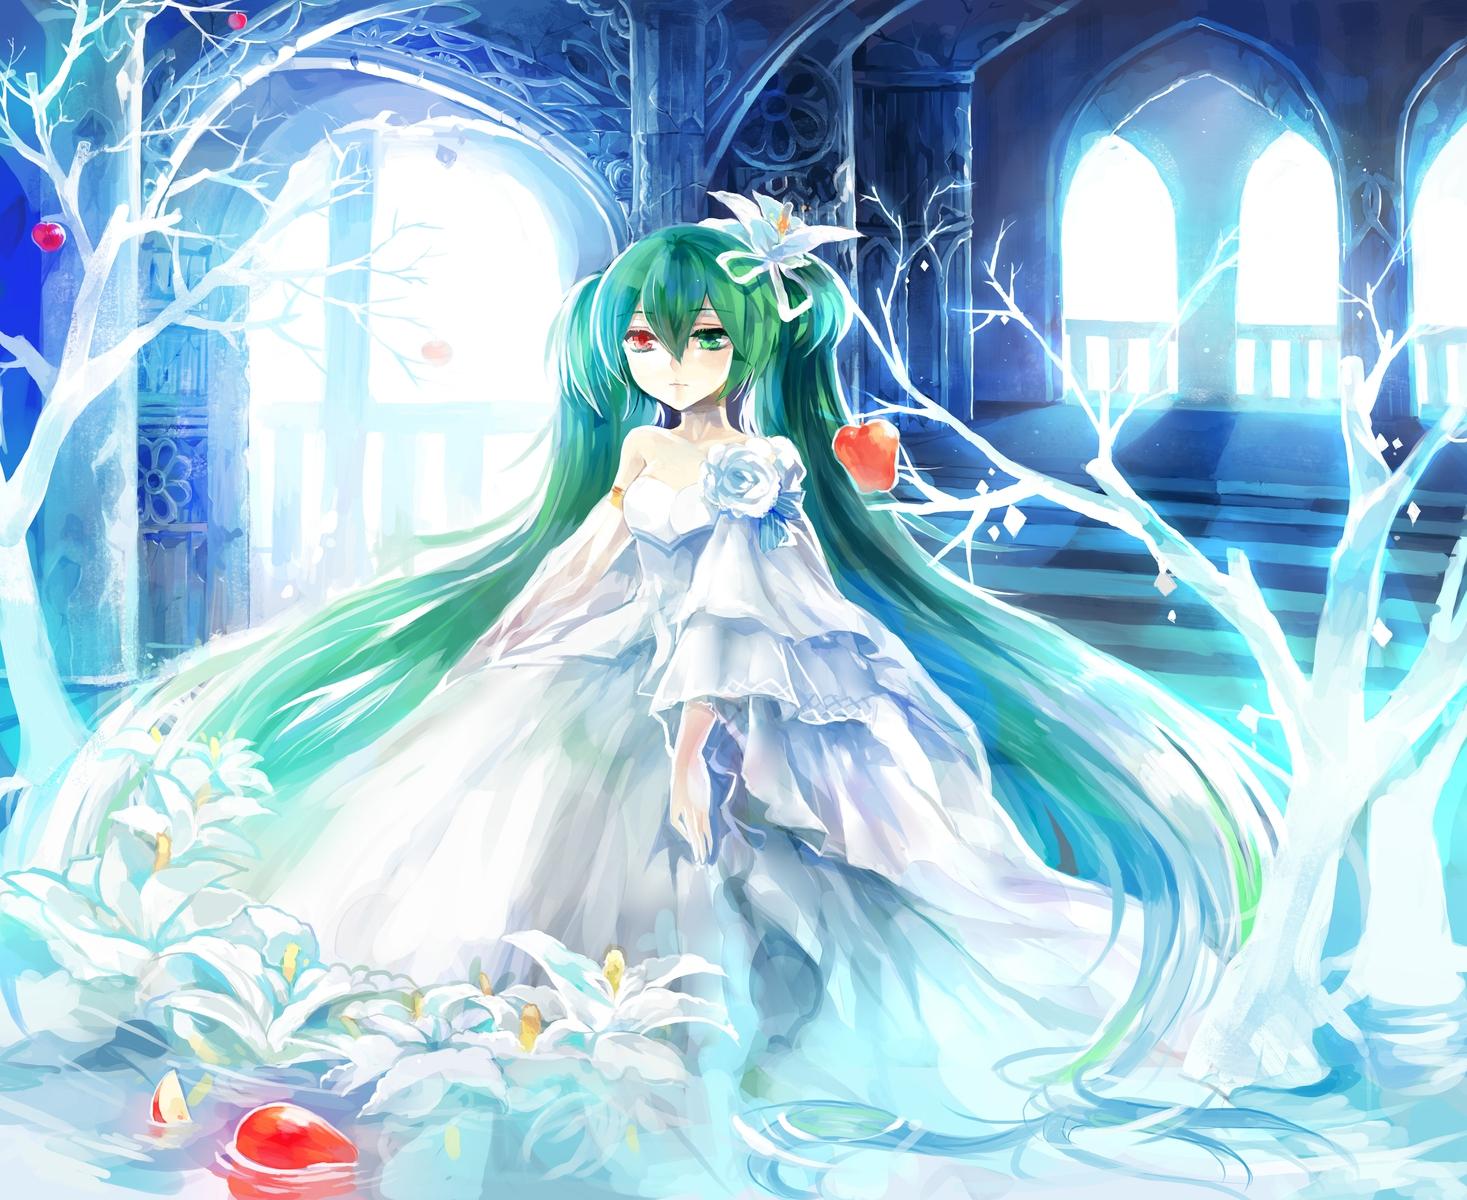 Cute Girls Dresess Cute Anime Wallpaper Hd Imagenes De Miku Hatsune Taringa